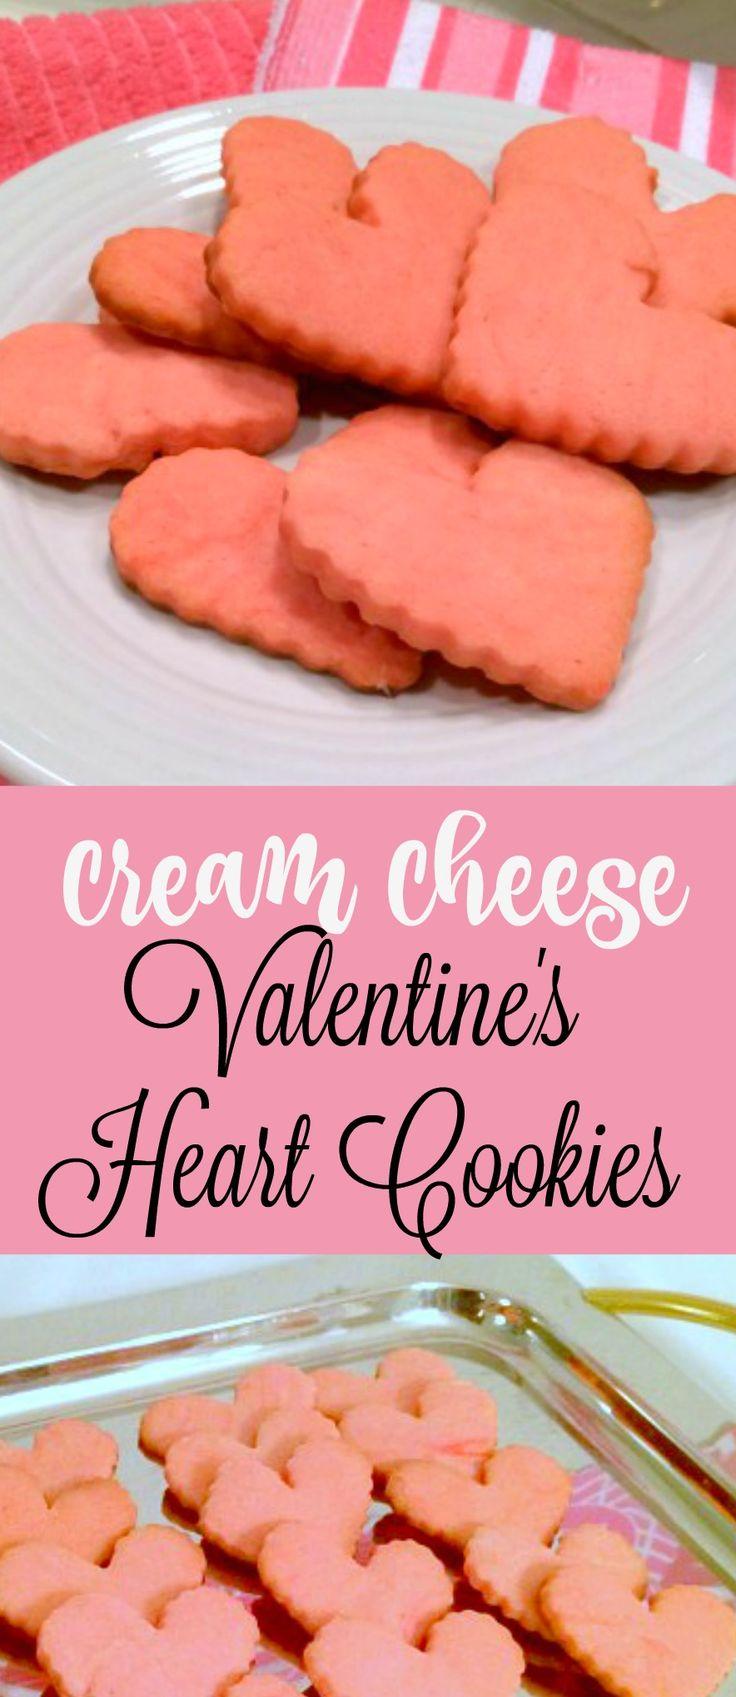 Cream Cheese Valentine's Cookies